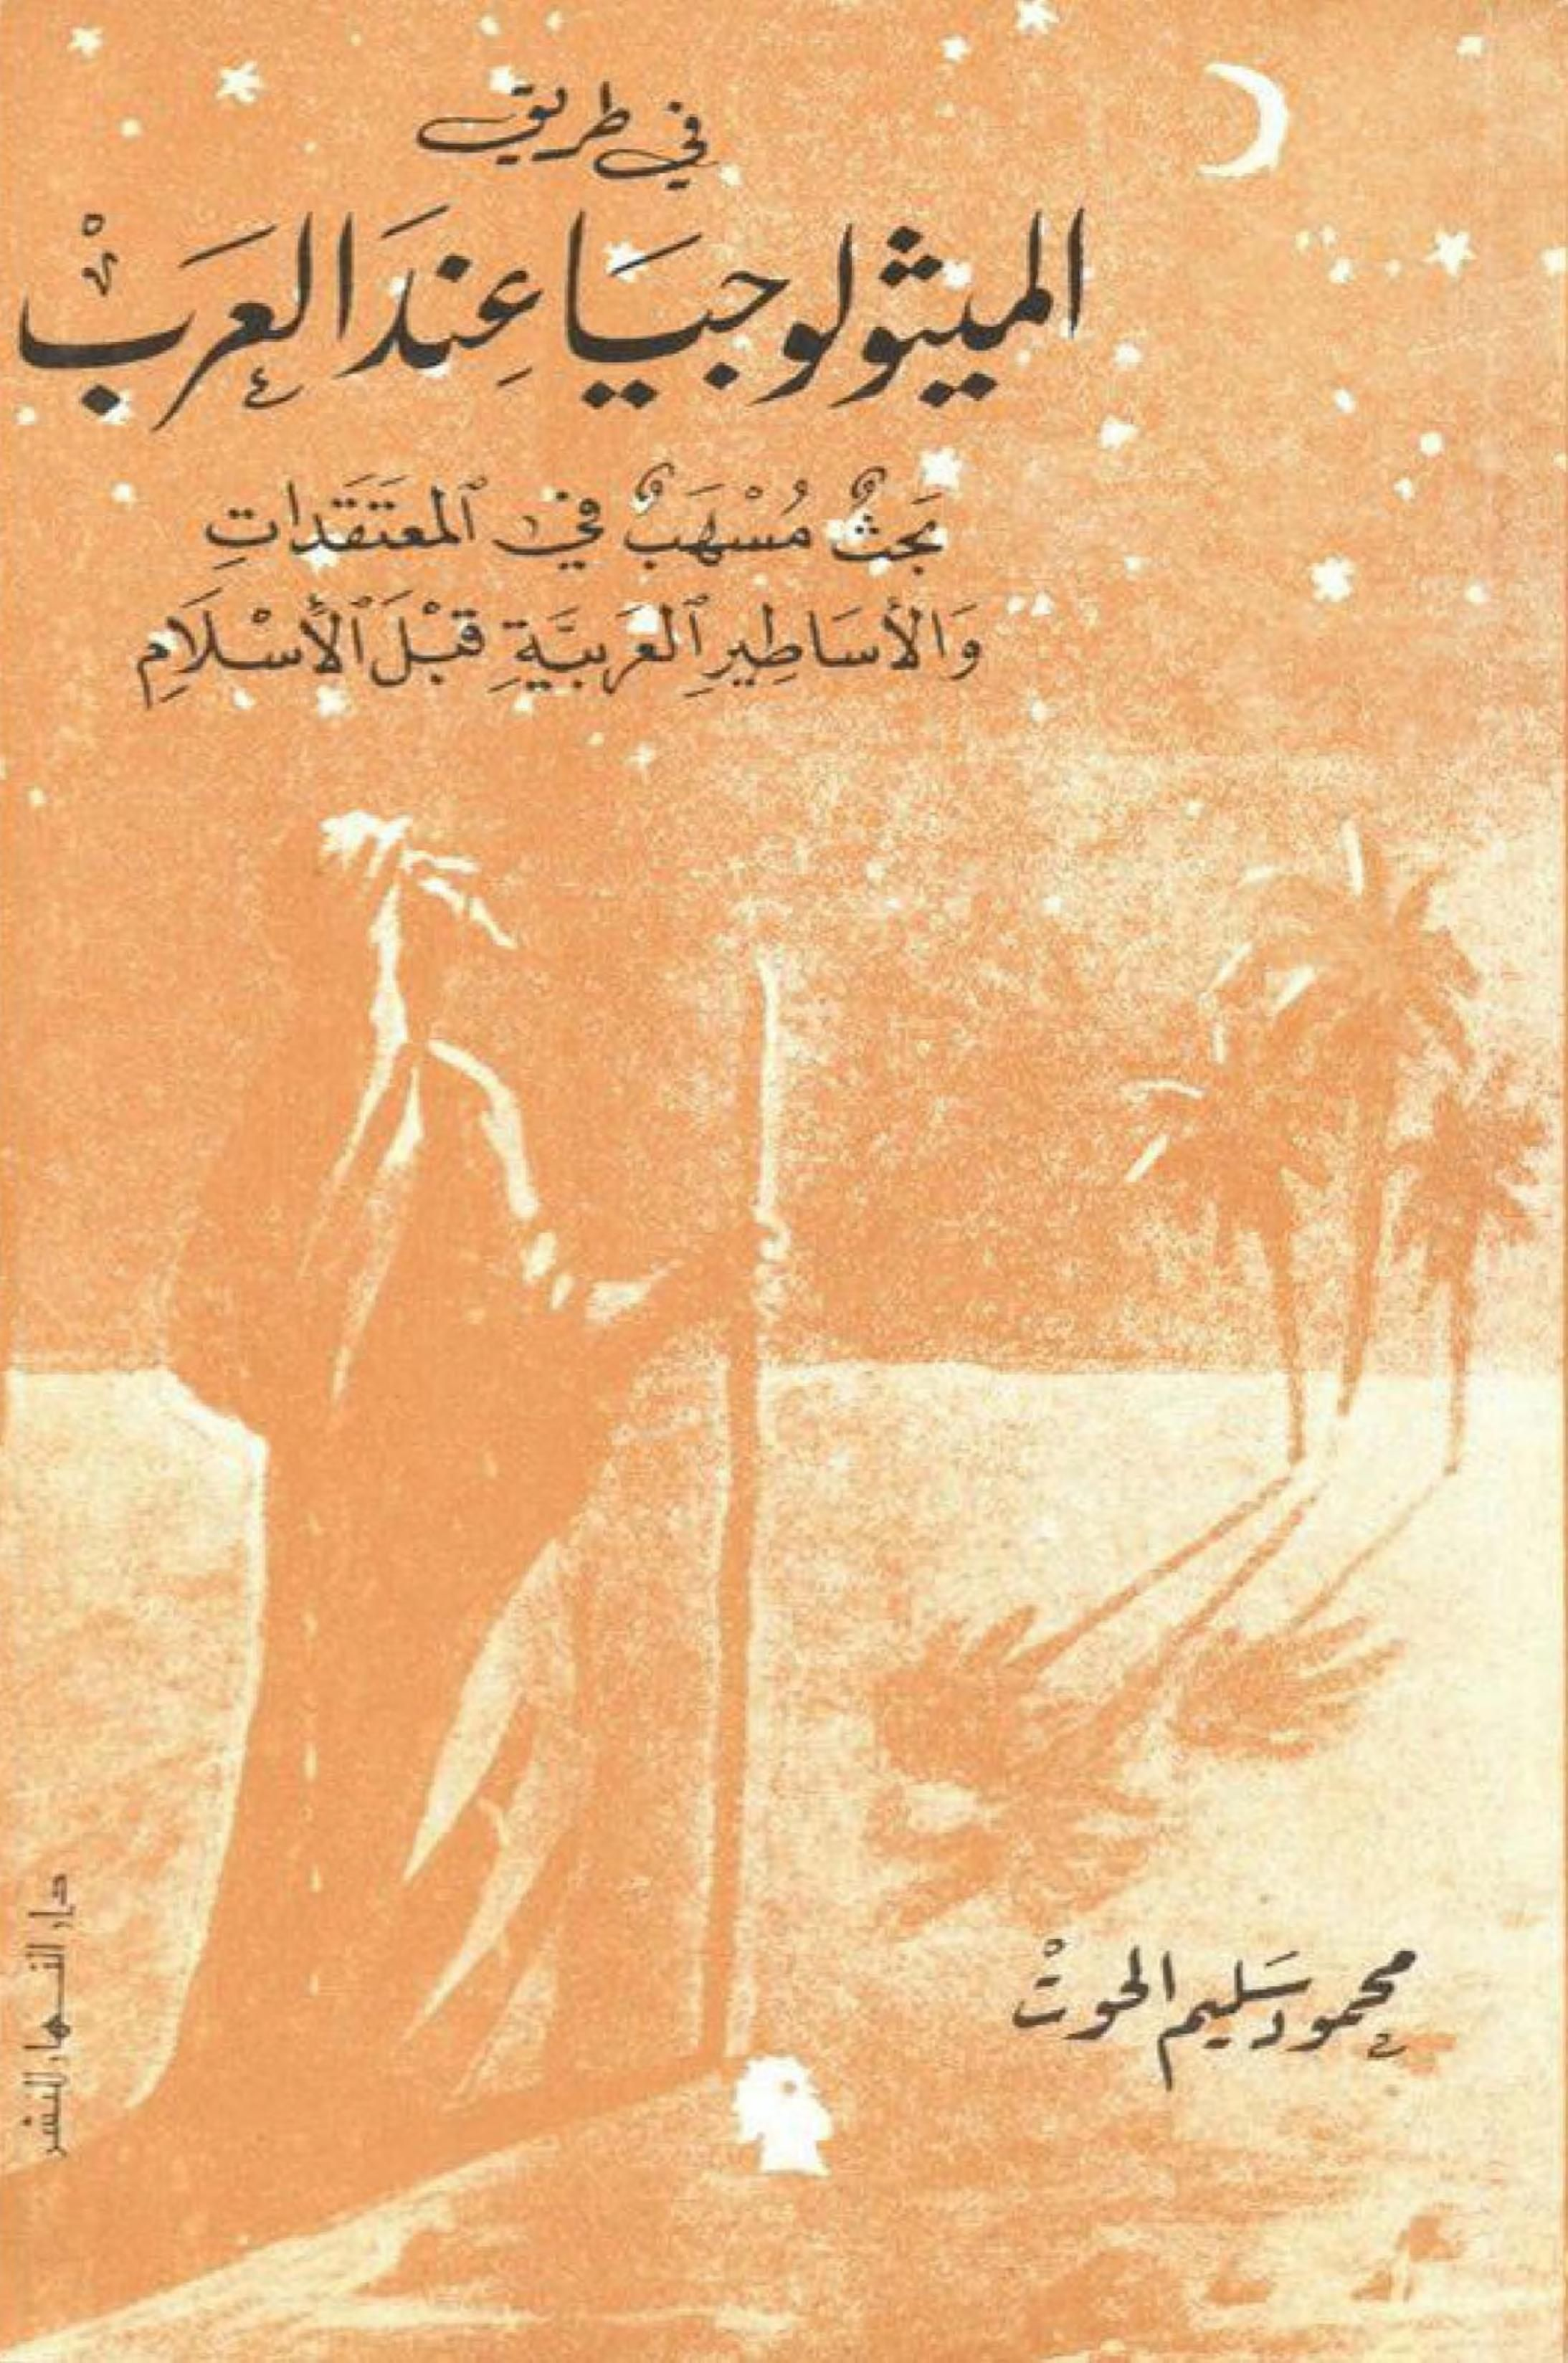 Https Archive Org Stream Firaqwmilal Ftmitholojia Philosophy Books Pdf Books Reading Ebooks Free Books